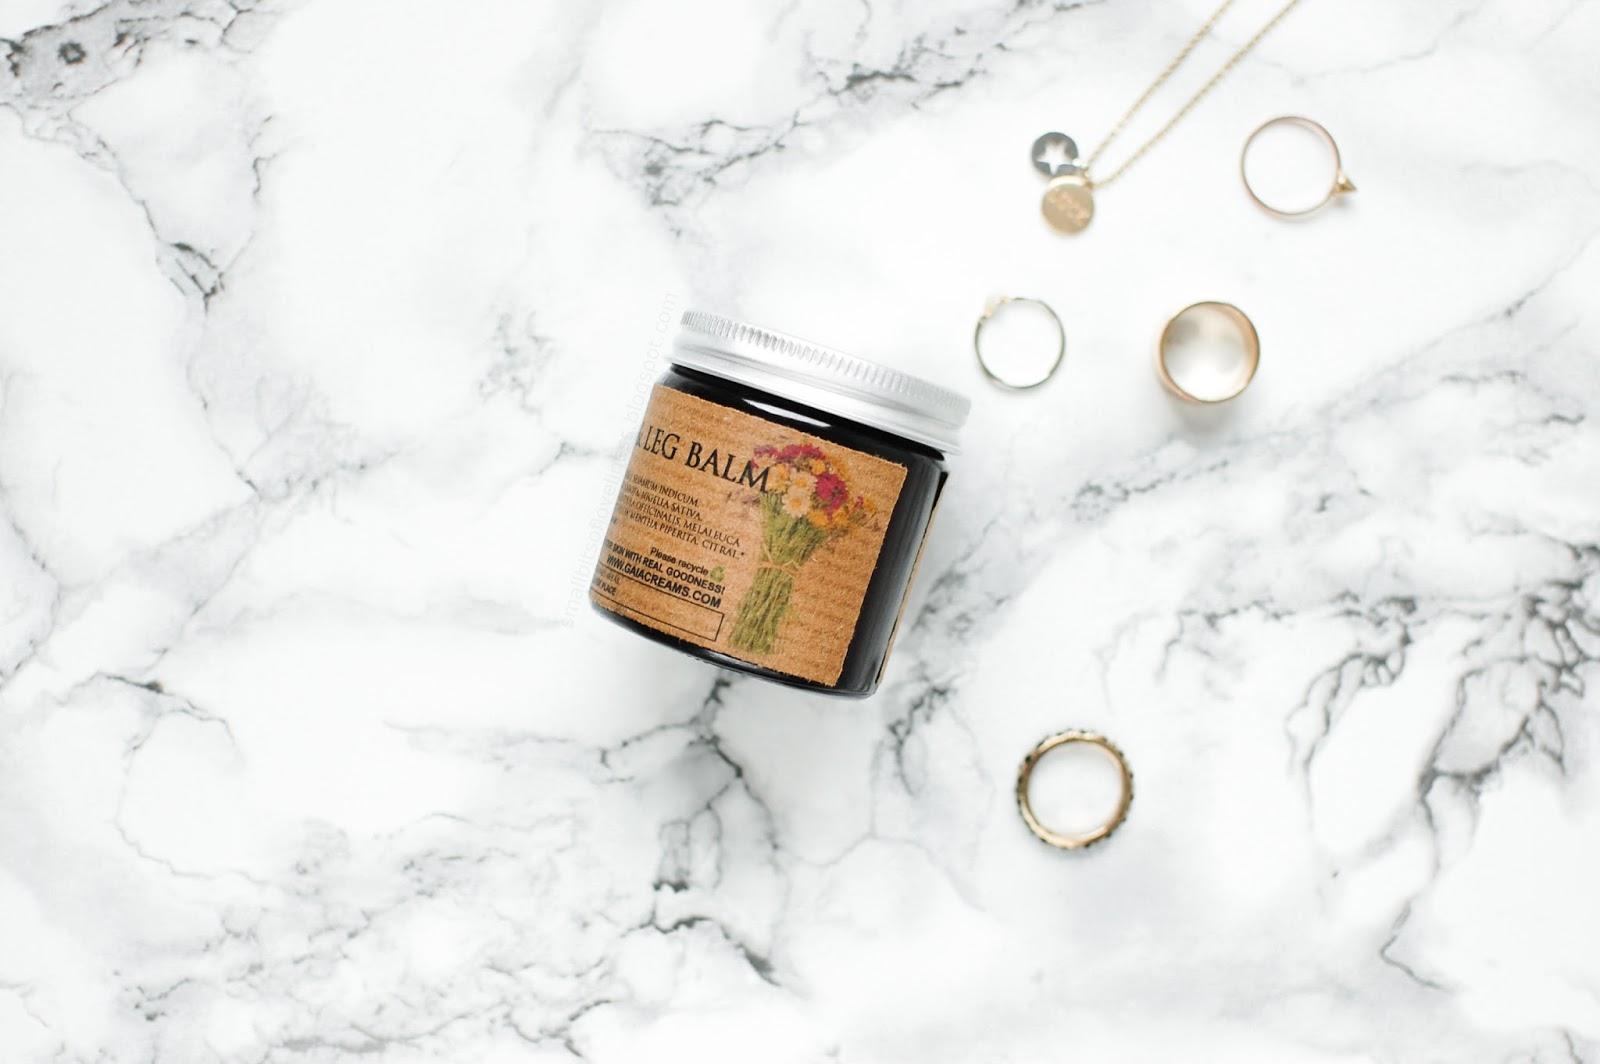 Gaia Creams Gorgeous Foot & Leg Balm, organic & vegan